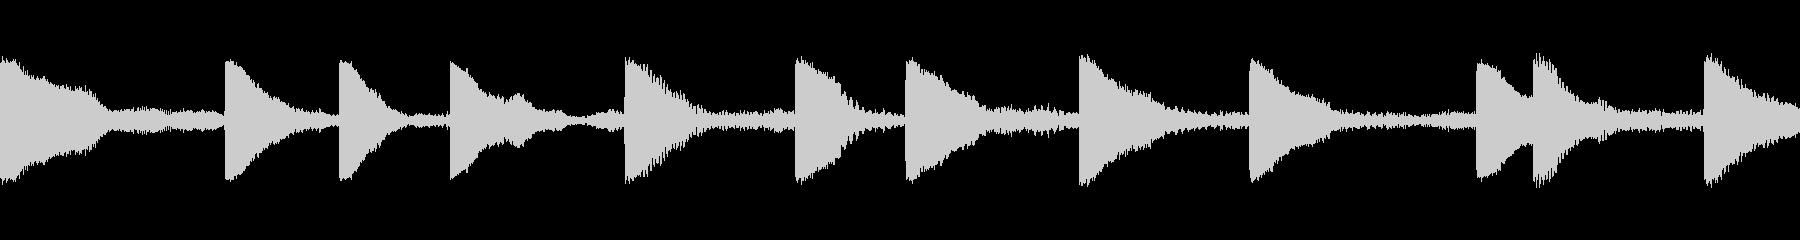 EDM PluckLoop2 音楽制作用の未再生の波形